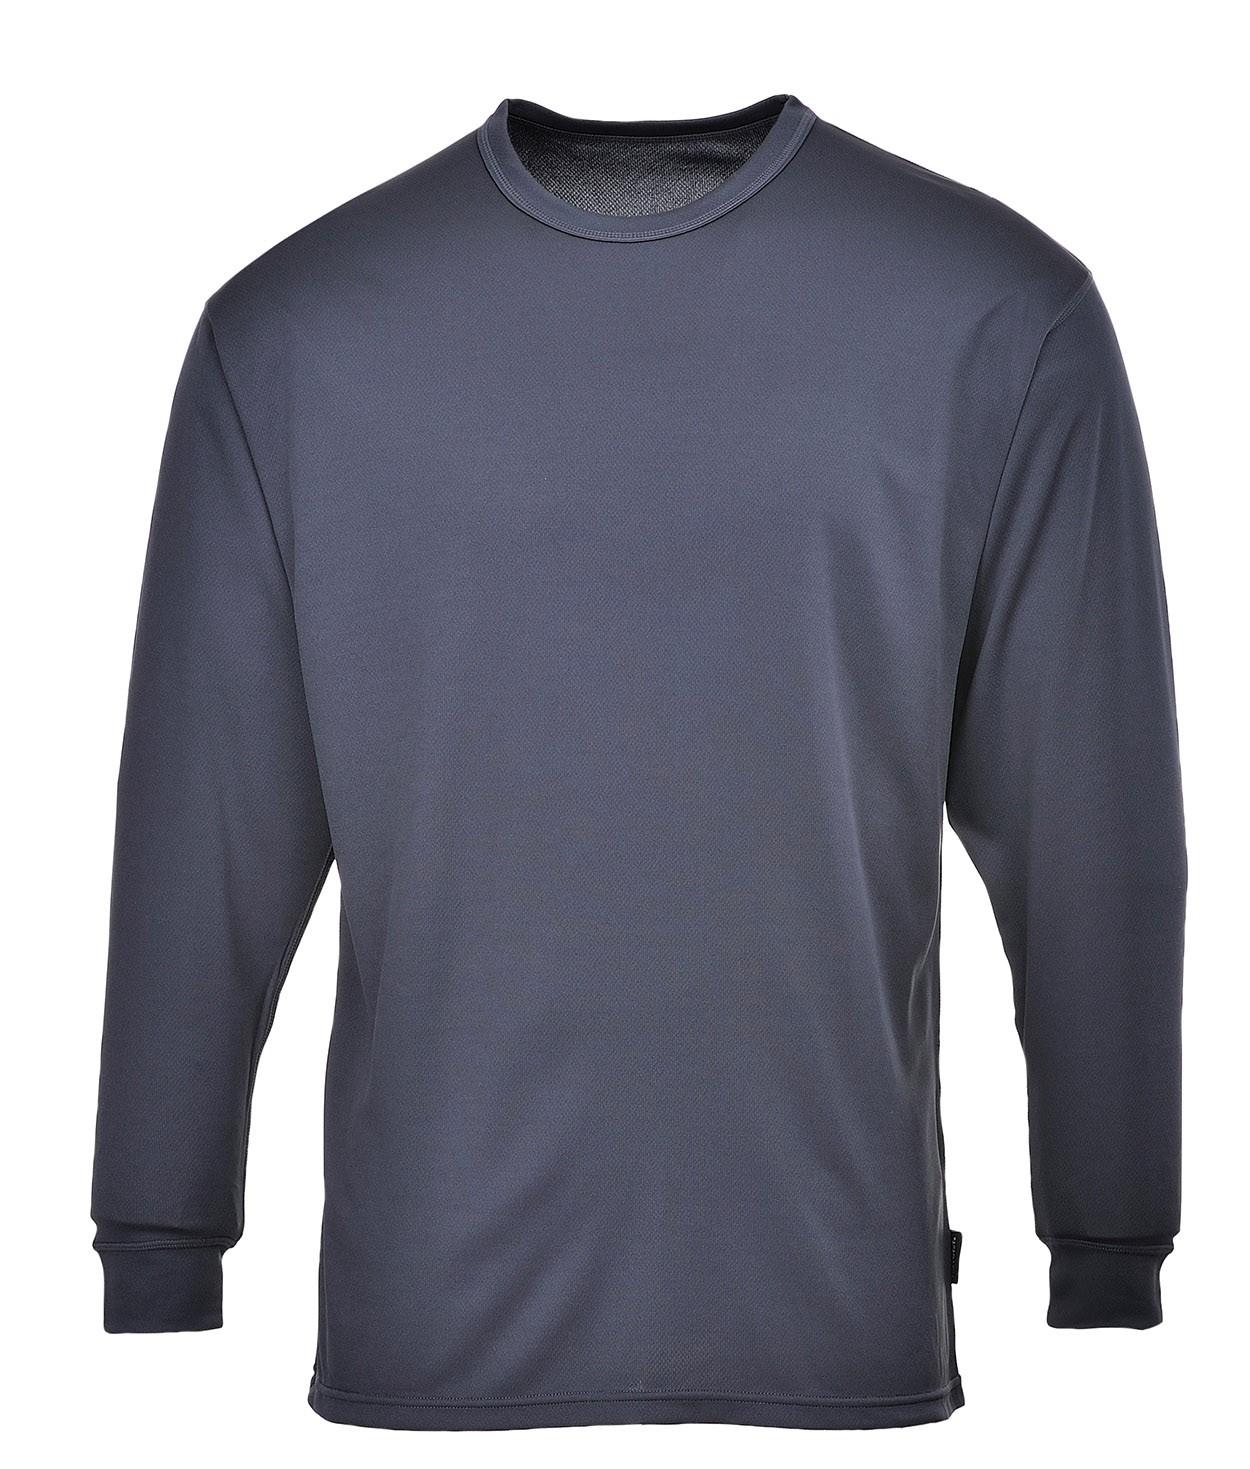 High performance base layer long sleeve top